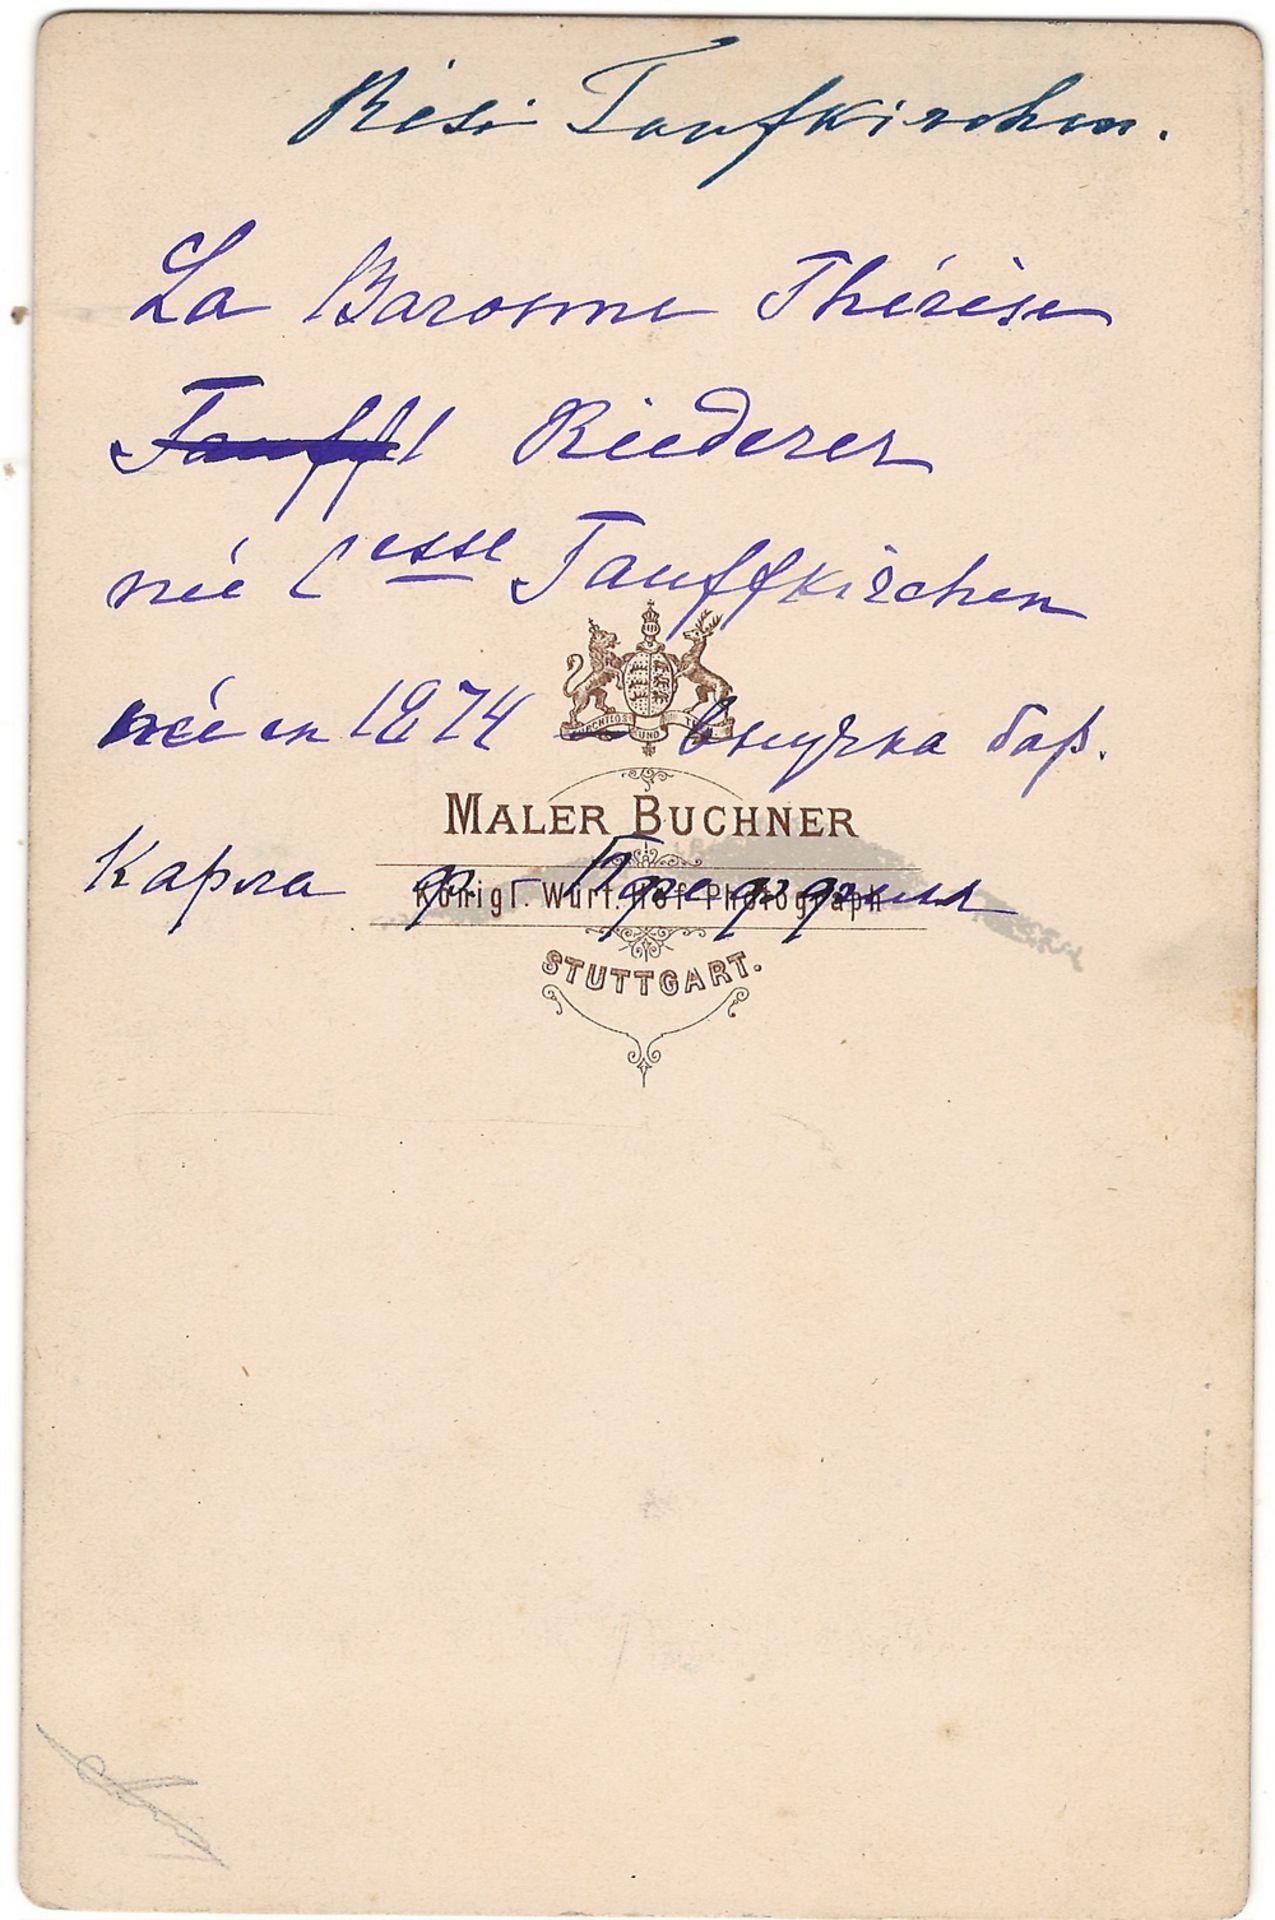 Buchner, M. Cabinet portrait of baroness Teresa Riderer-Taufkirkсner. Photograph. Author's print. [1 - Bild 2 aus 2